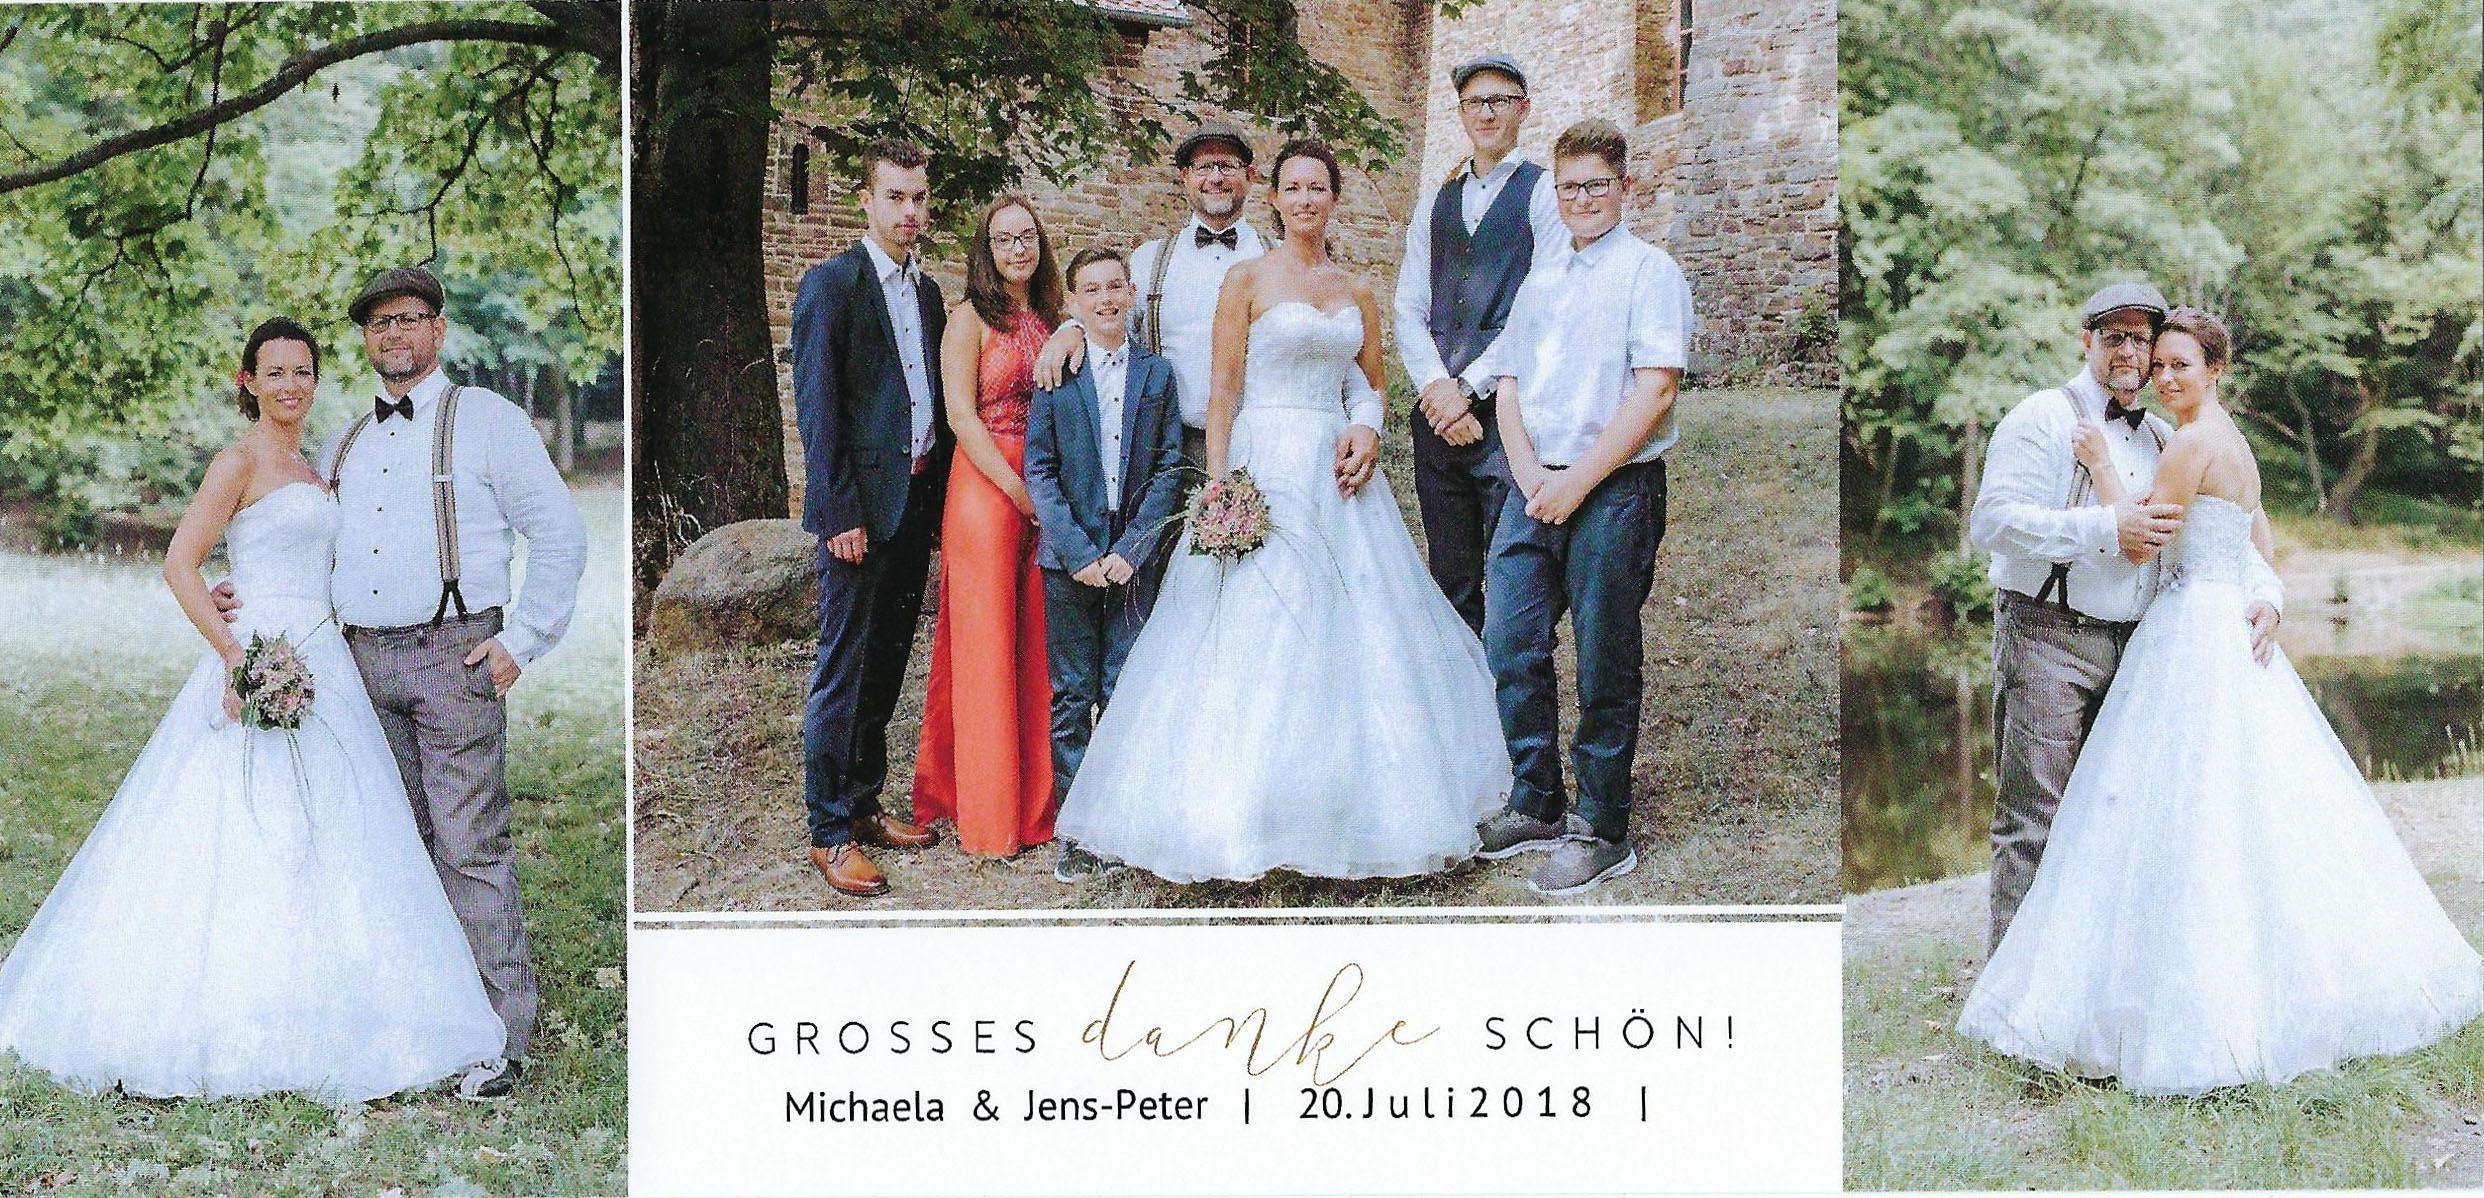 Michaela & Jens-Peter   ausgestattet von GolzeGlamourös